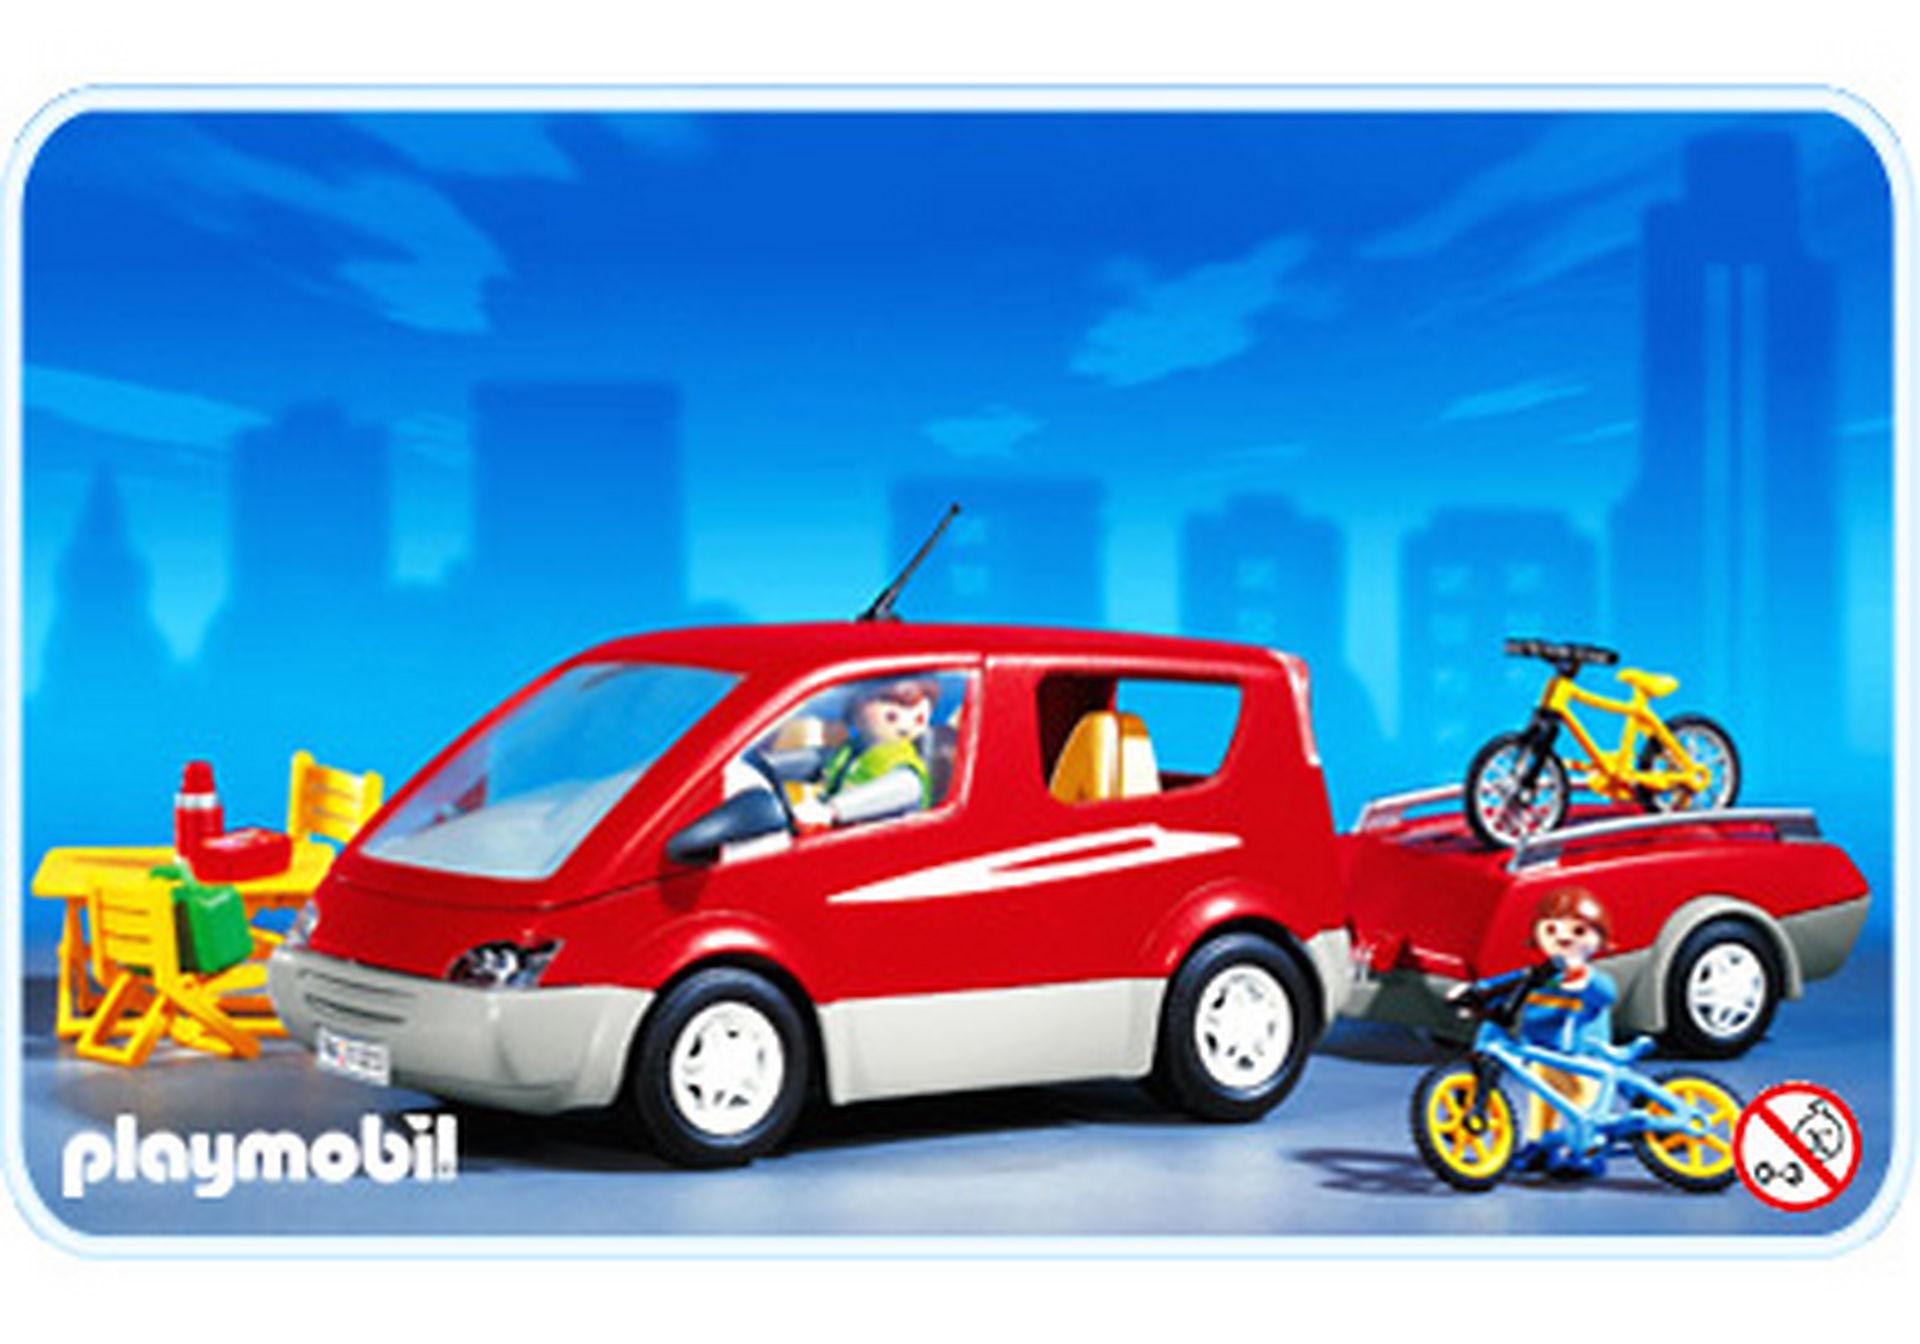 http://media.playmobil.com/i/playmobil/3213-A_product_detail/Monospace/remorque/équipement de loisirs